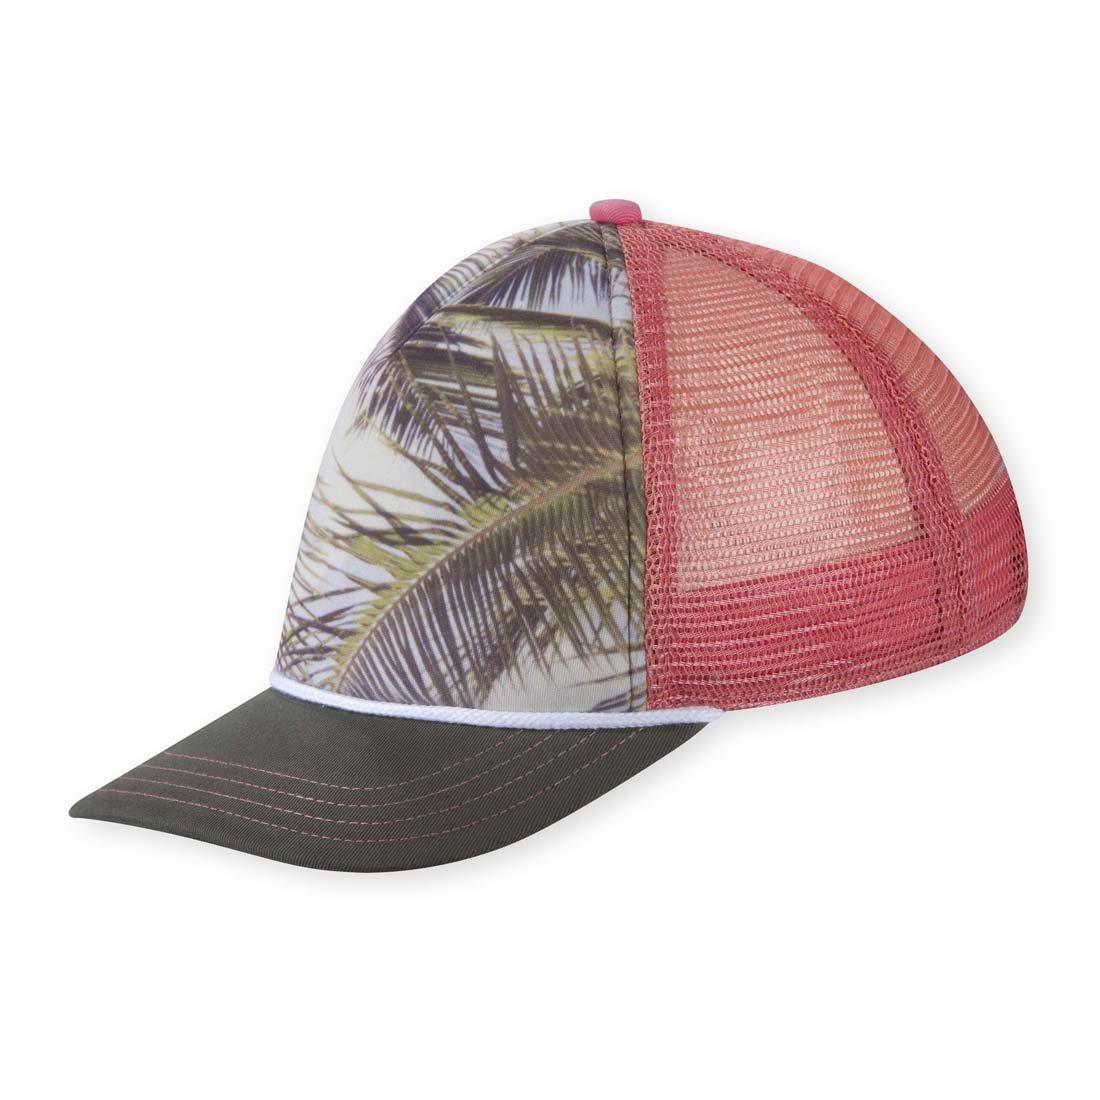 e90df94f6 Hats